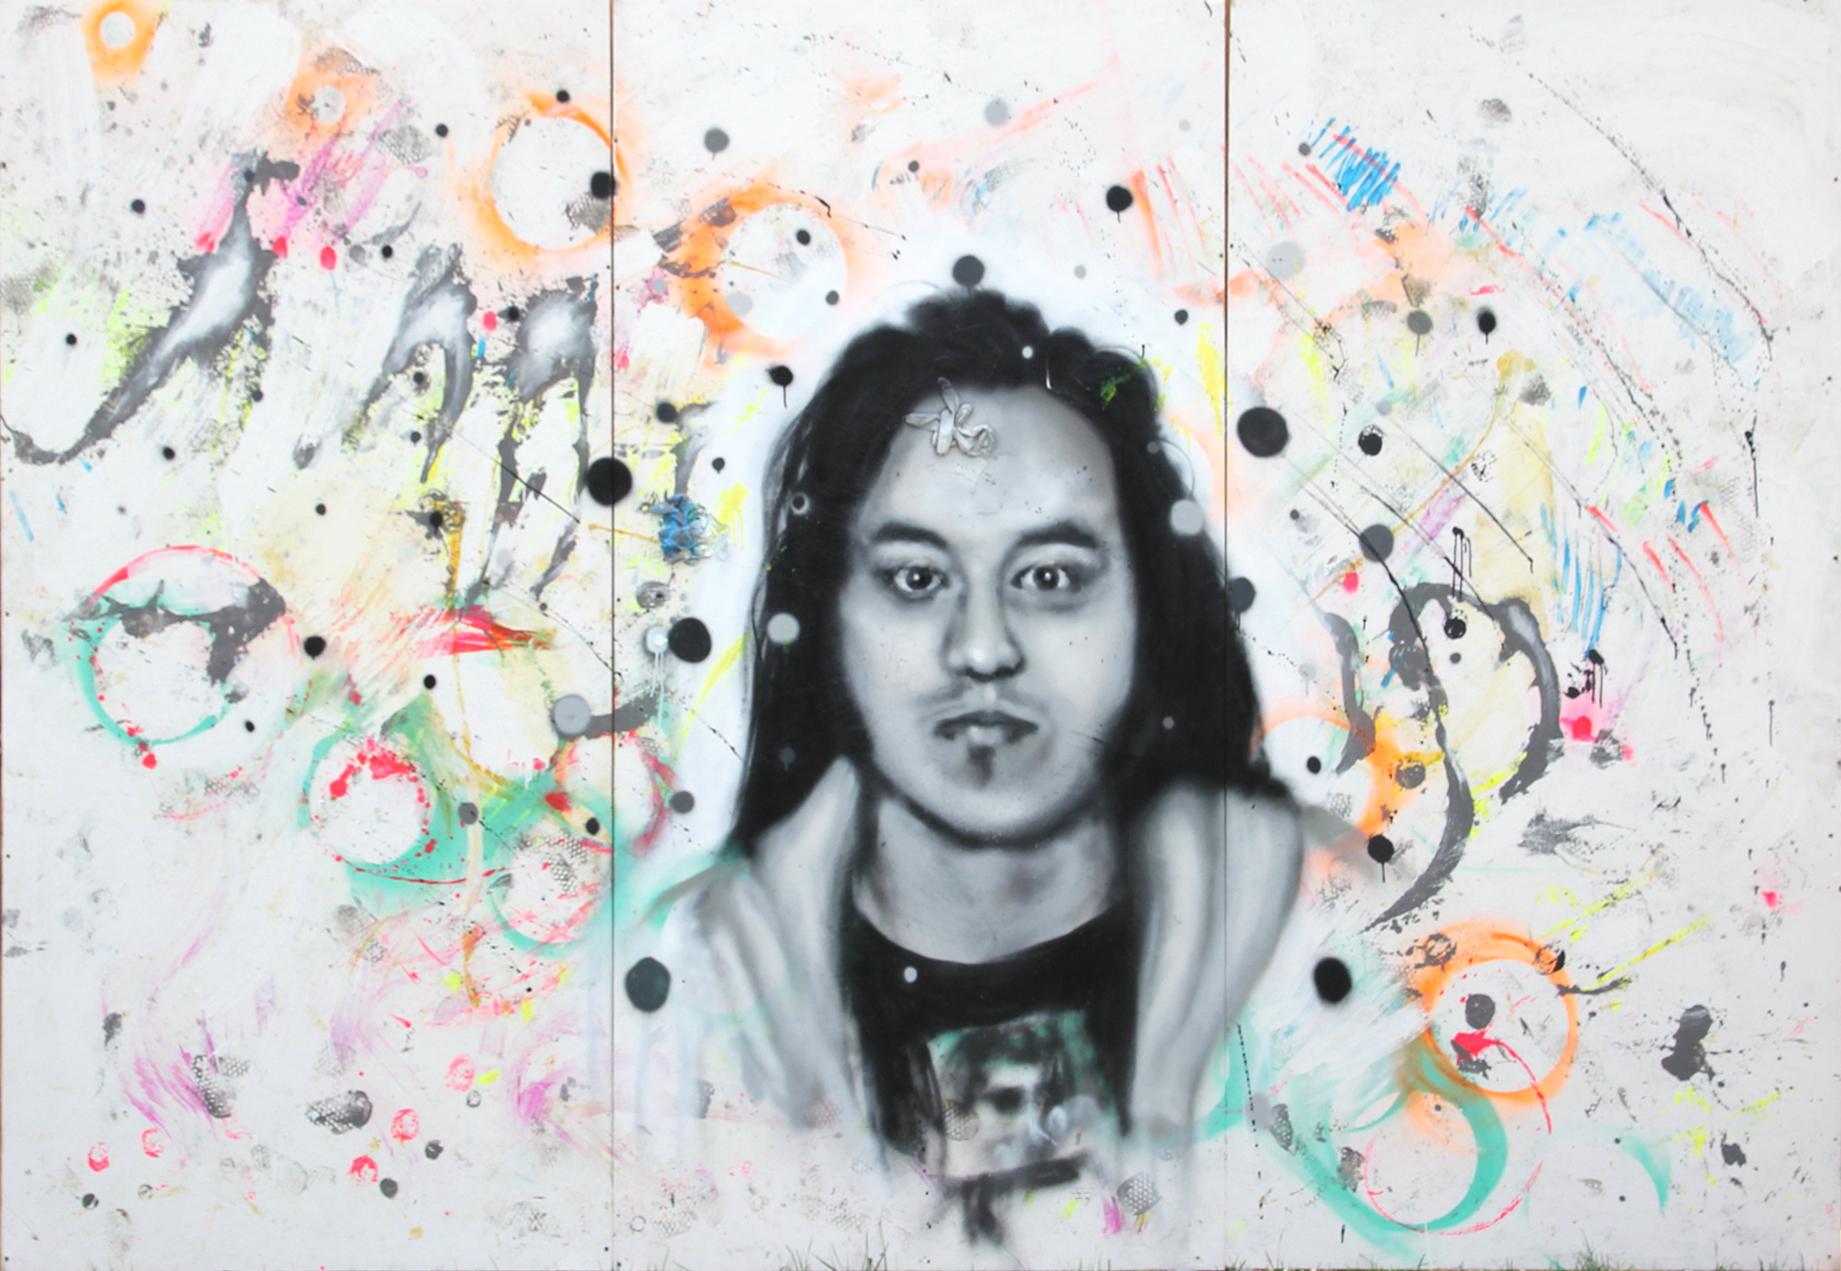 """Honda"". Aerosol and Acrylic on Wood Panels. 12ftx8ft. 2016. Painted live at Treefort Music Festival"